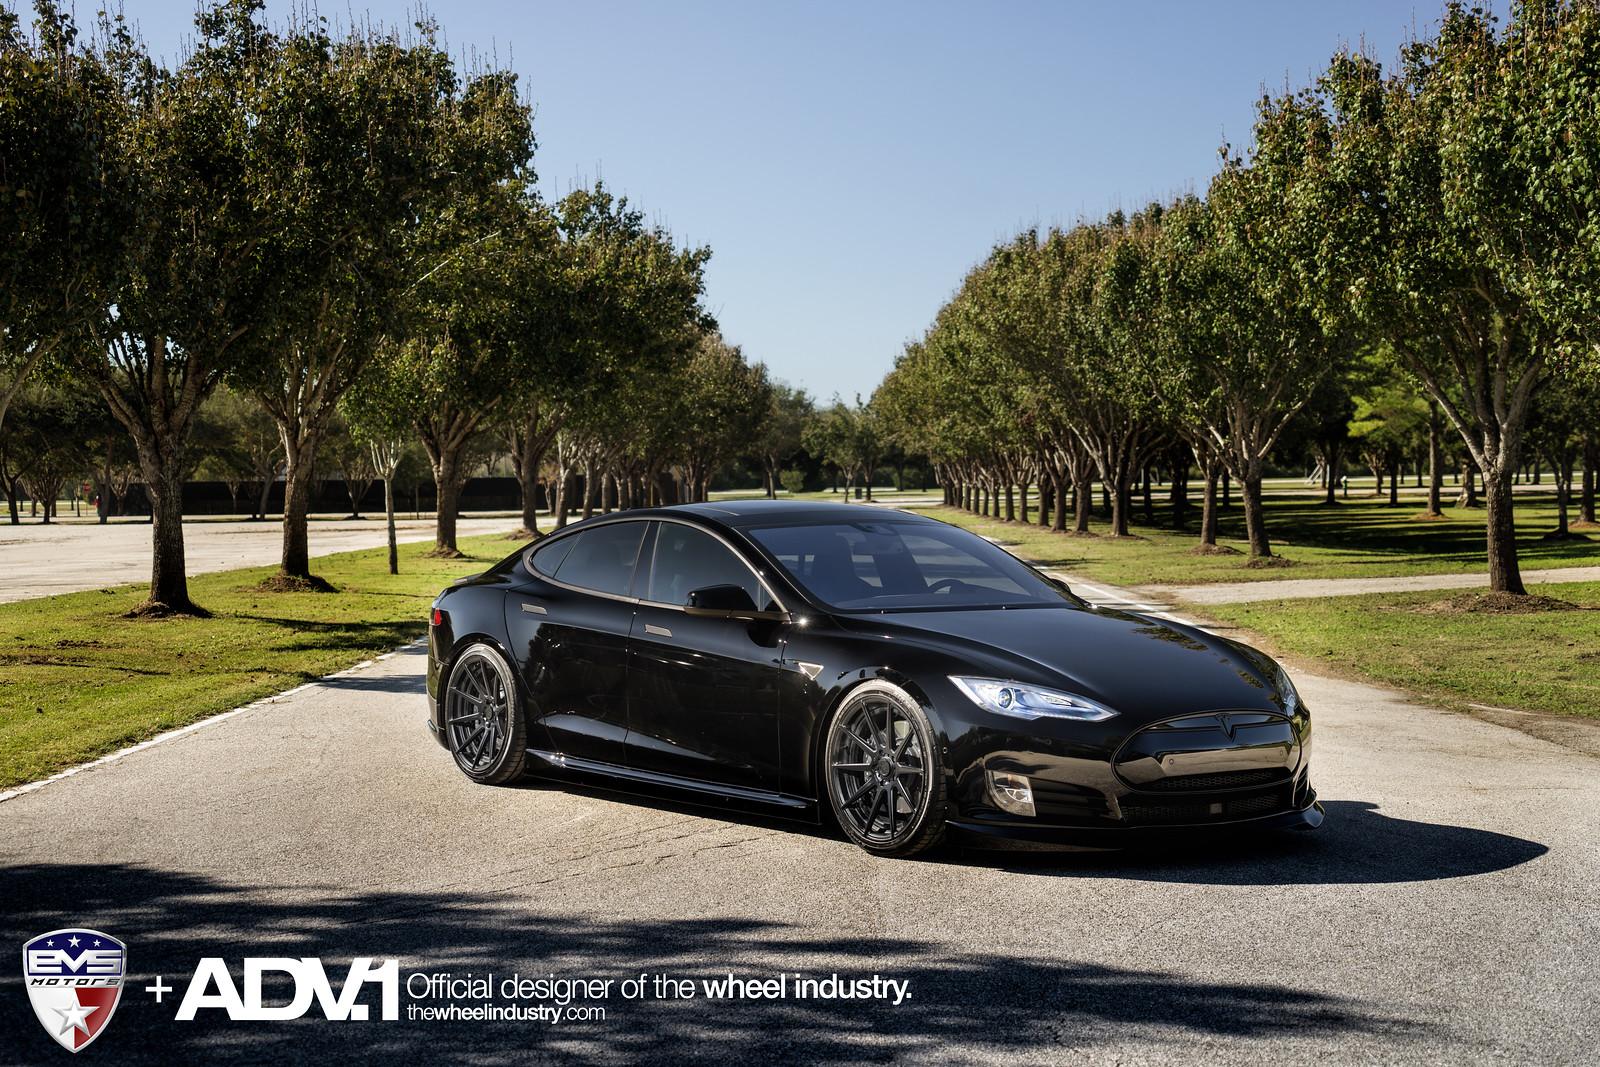 ADV1_EVS_Motors_Tesla_Model_S-7-X3.jpg